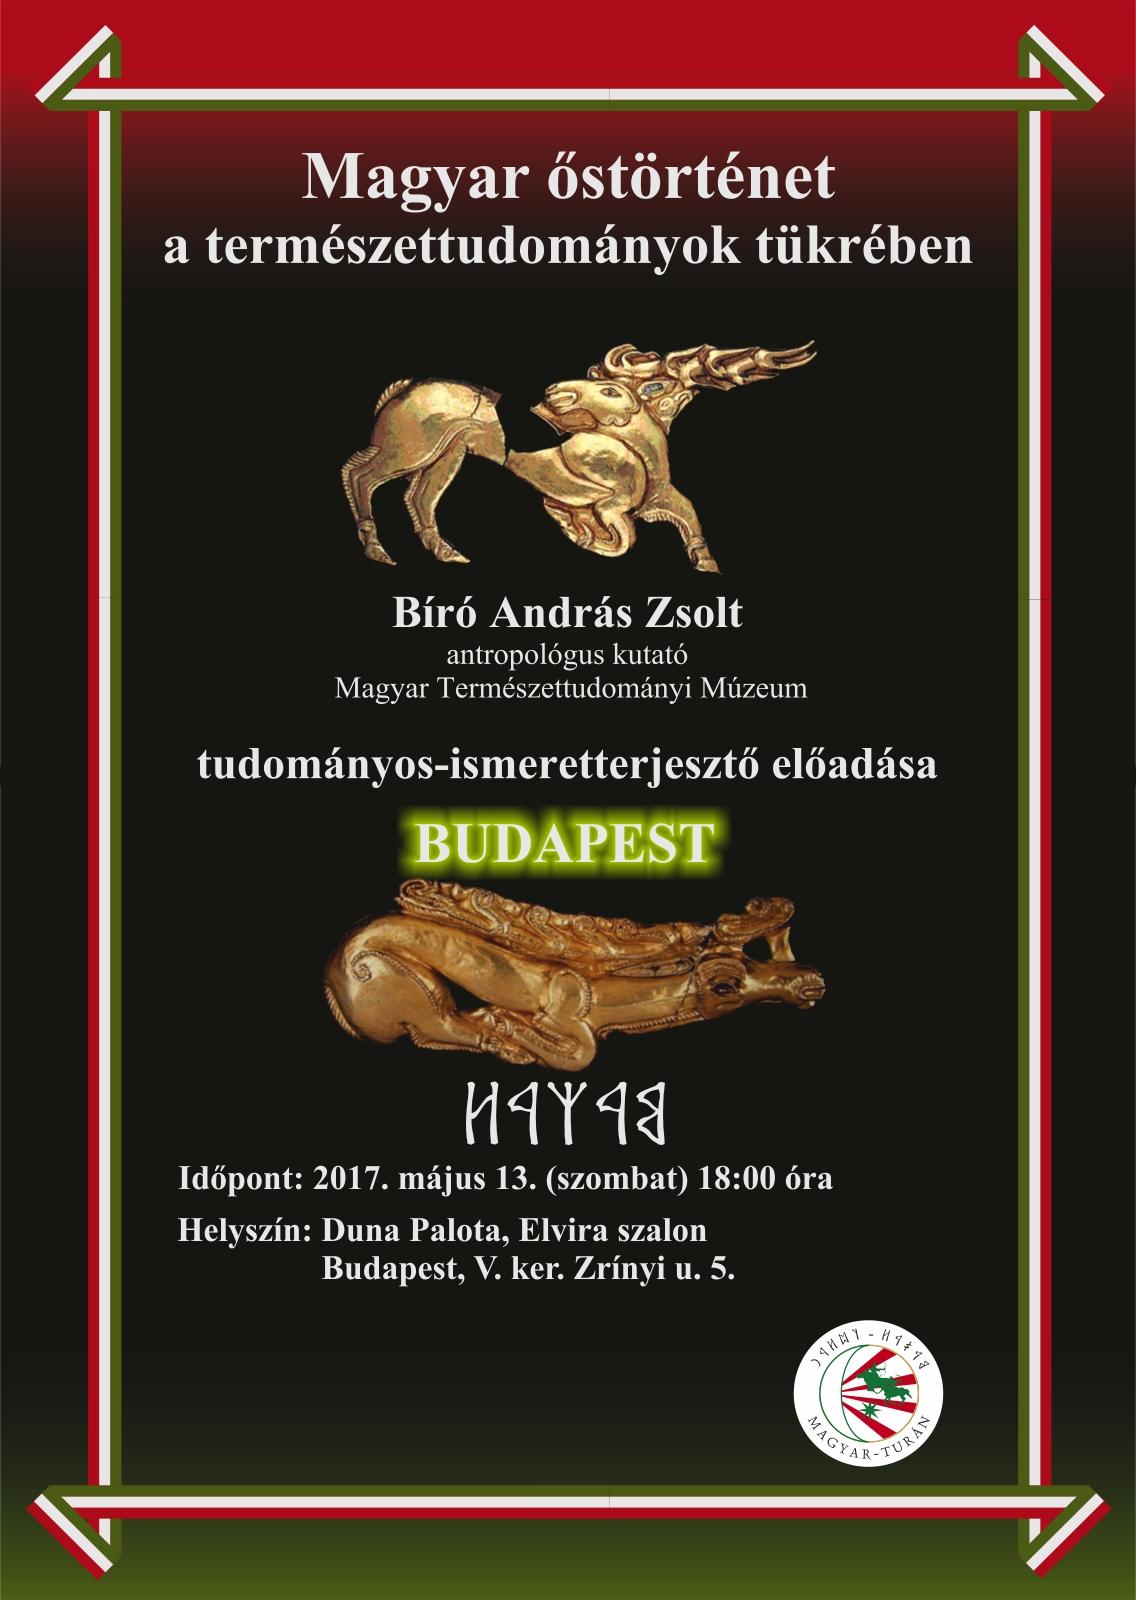 PLAKAT_BUDAPEST